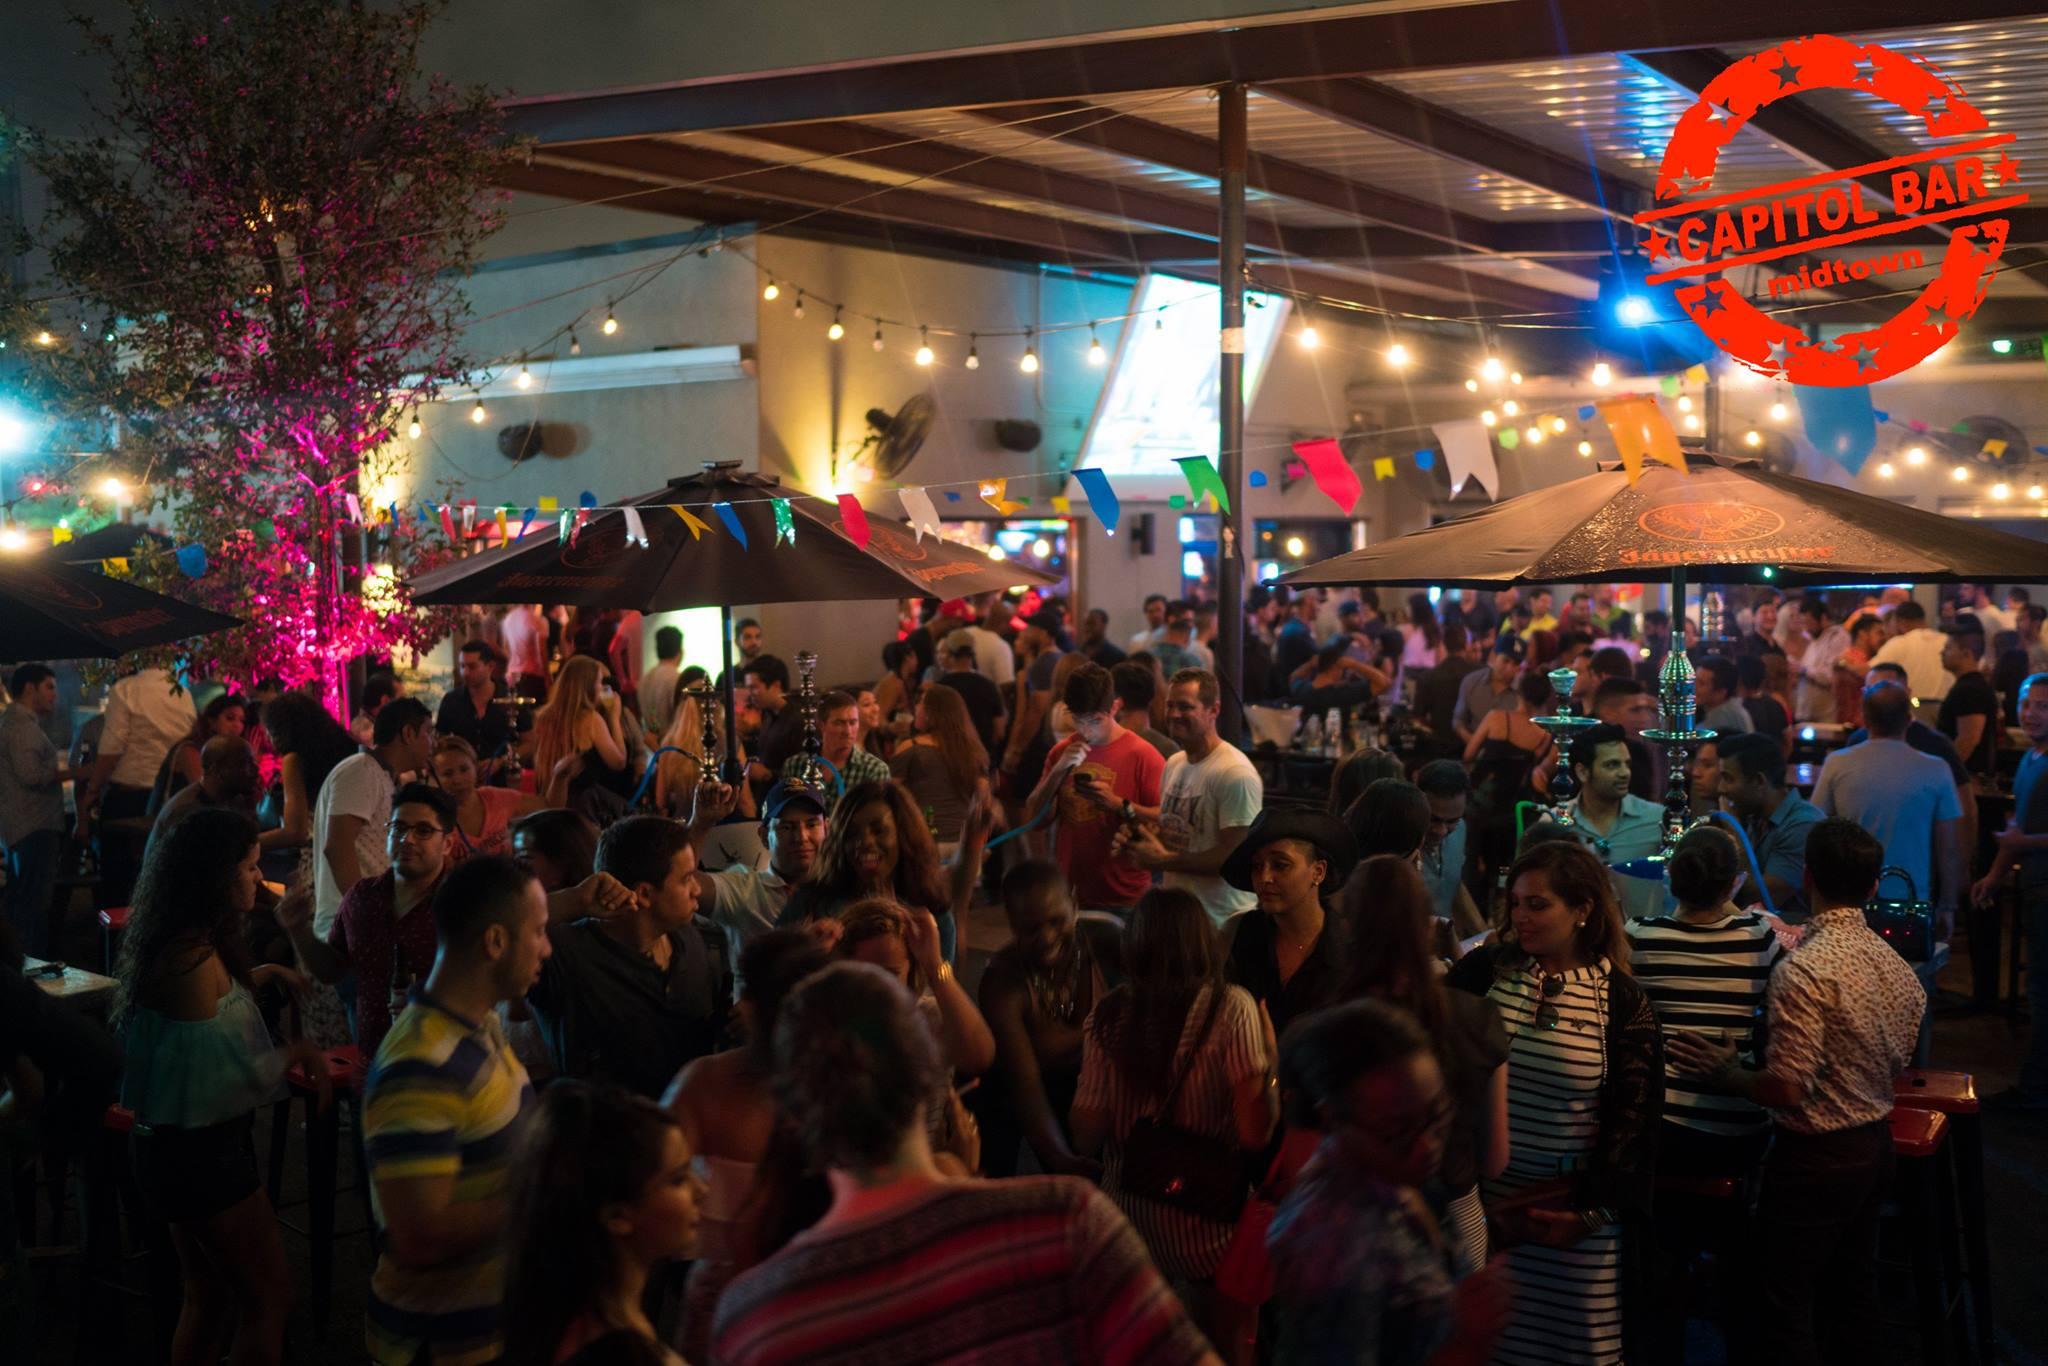 Houston Midtown Patio Bar Outdoor Music Food Games TVs